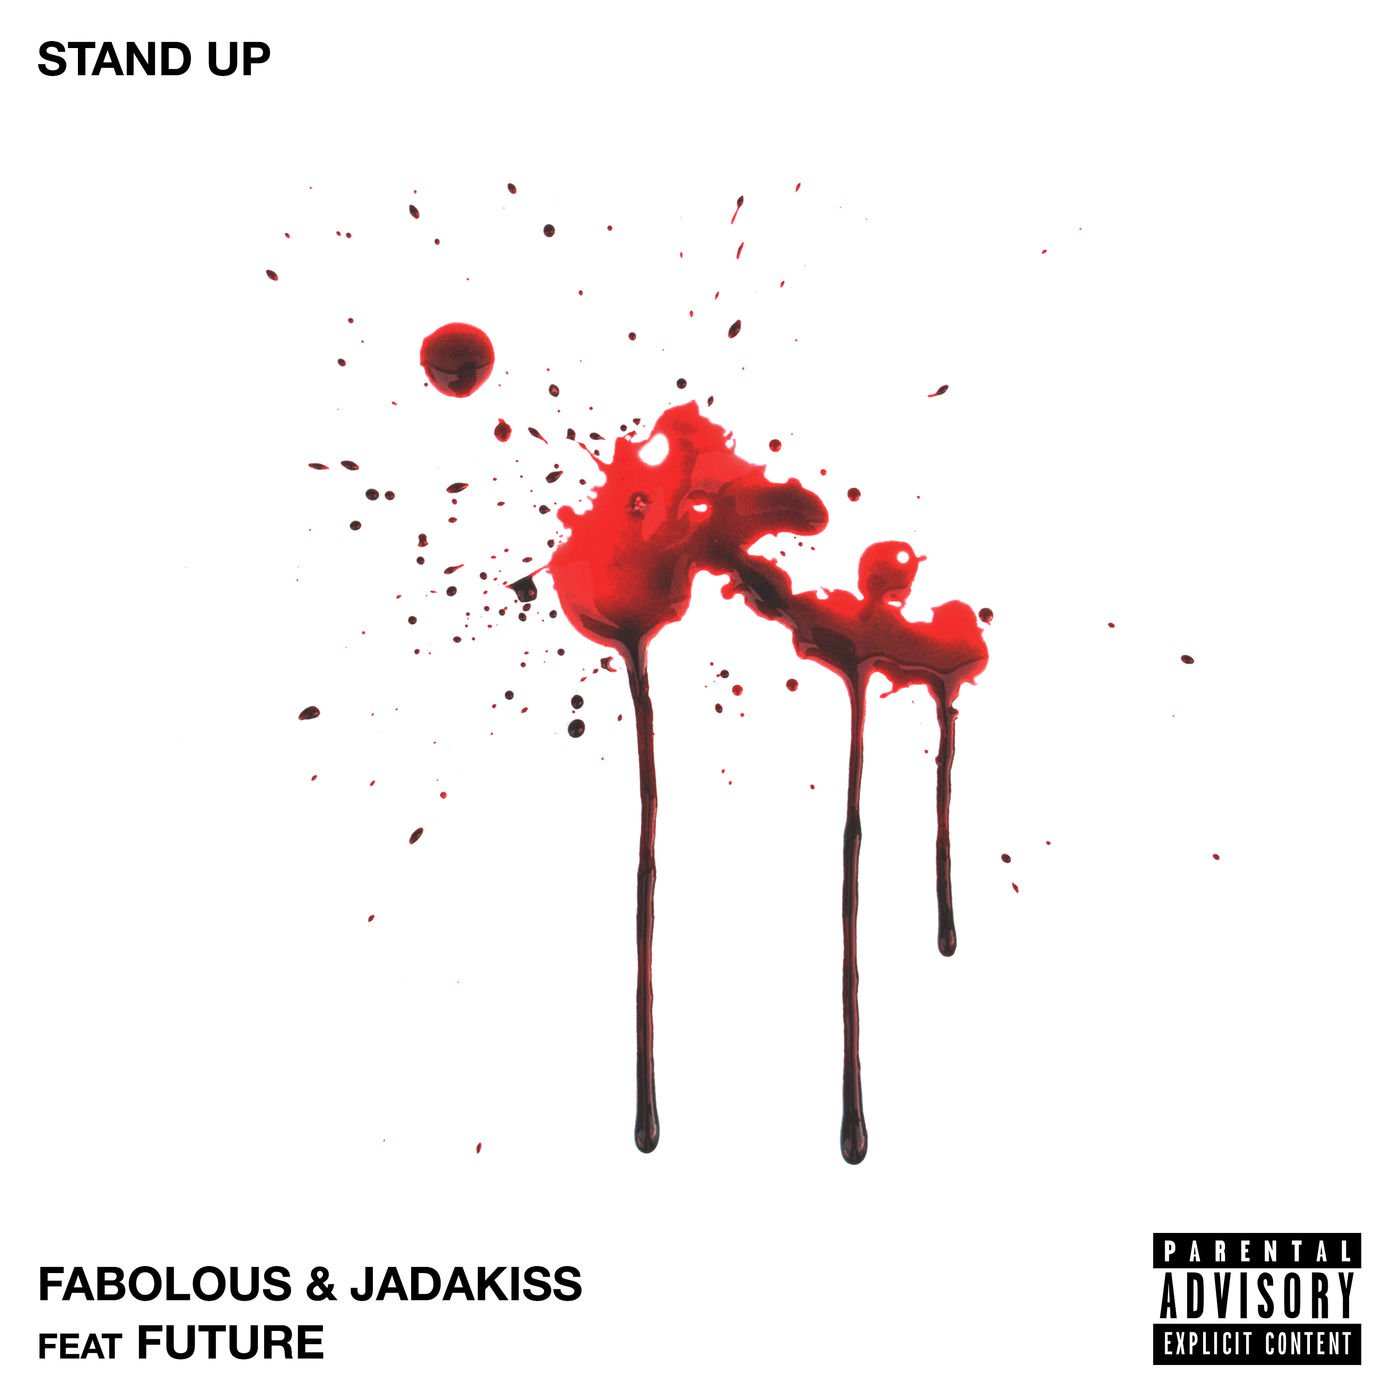 Fabolous & Jadakiss – Stand Up (feat. Future)